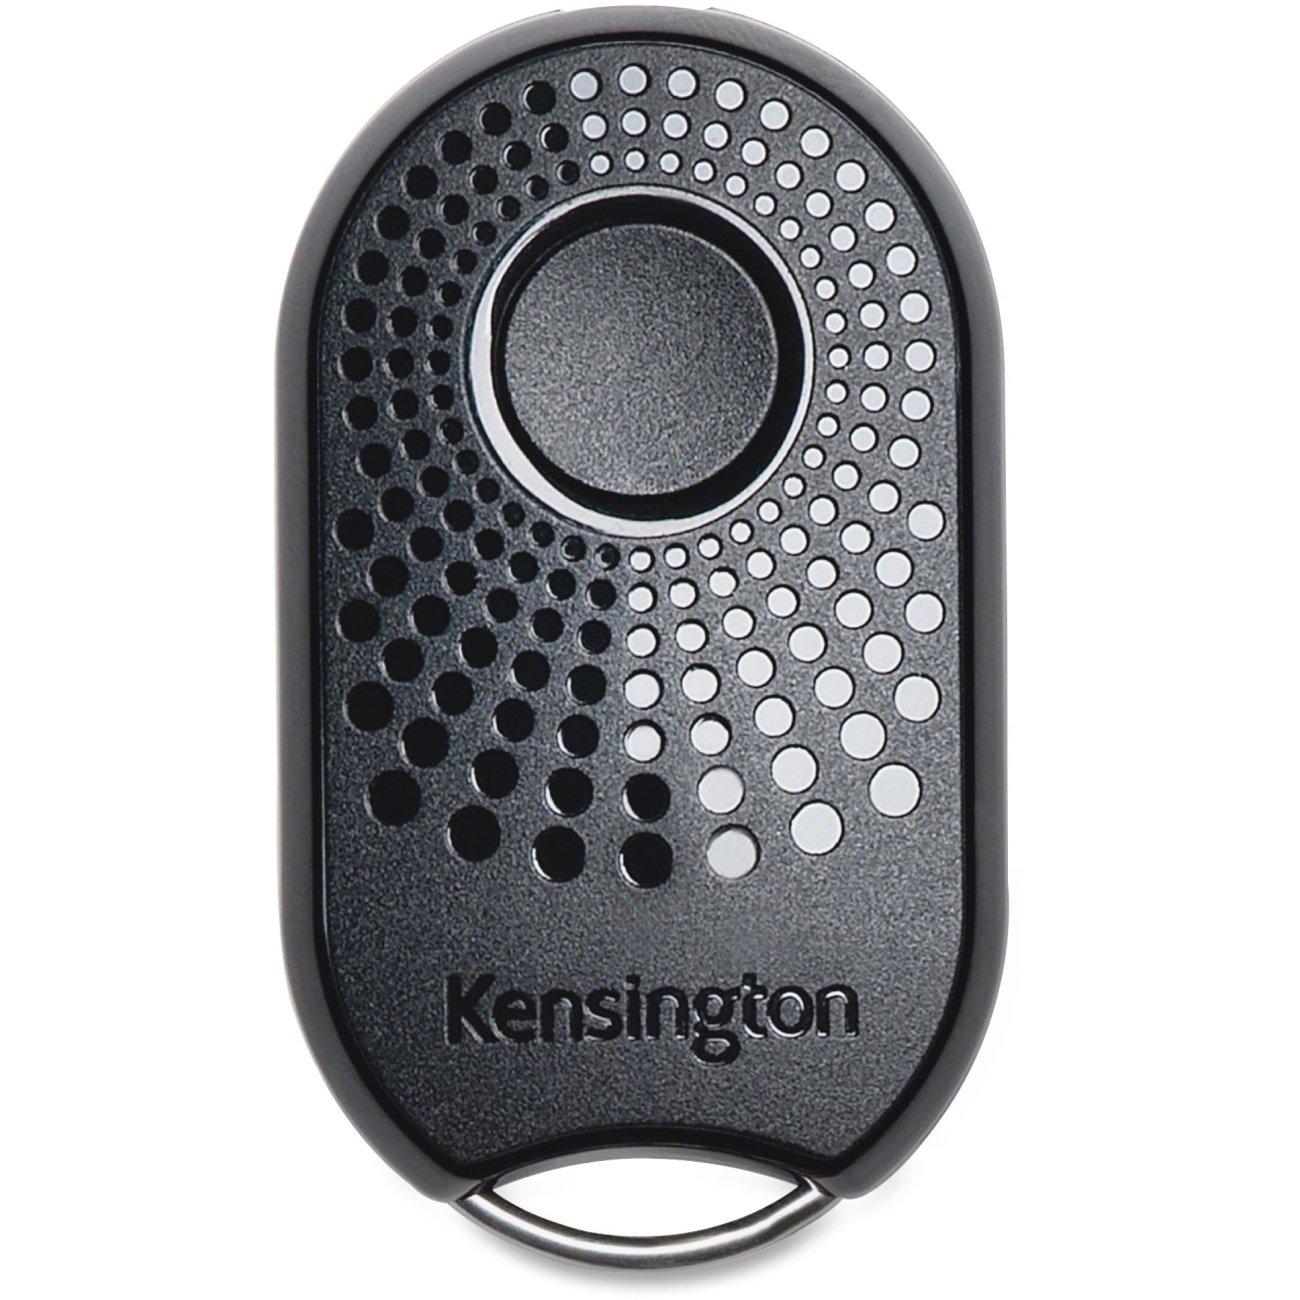 kmw97150 - Kensington Proximo llavero Bluetooth tracker ...